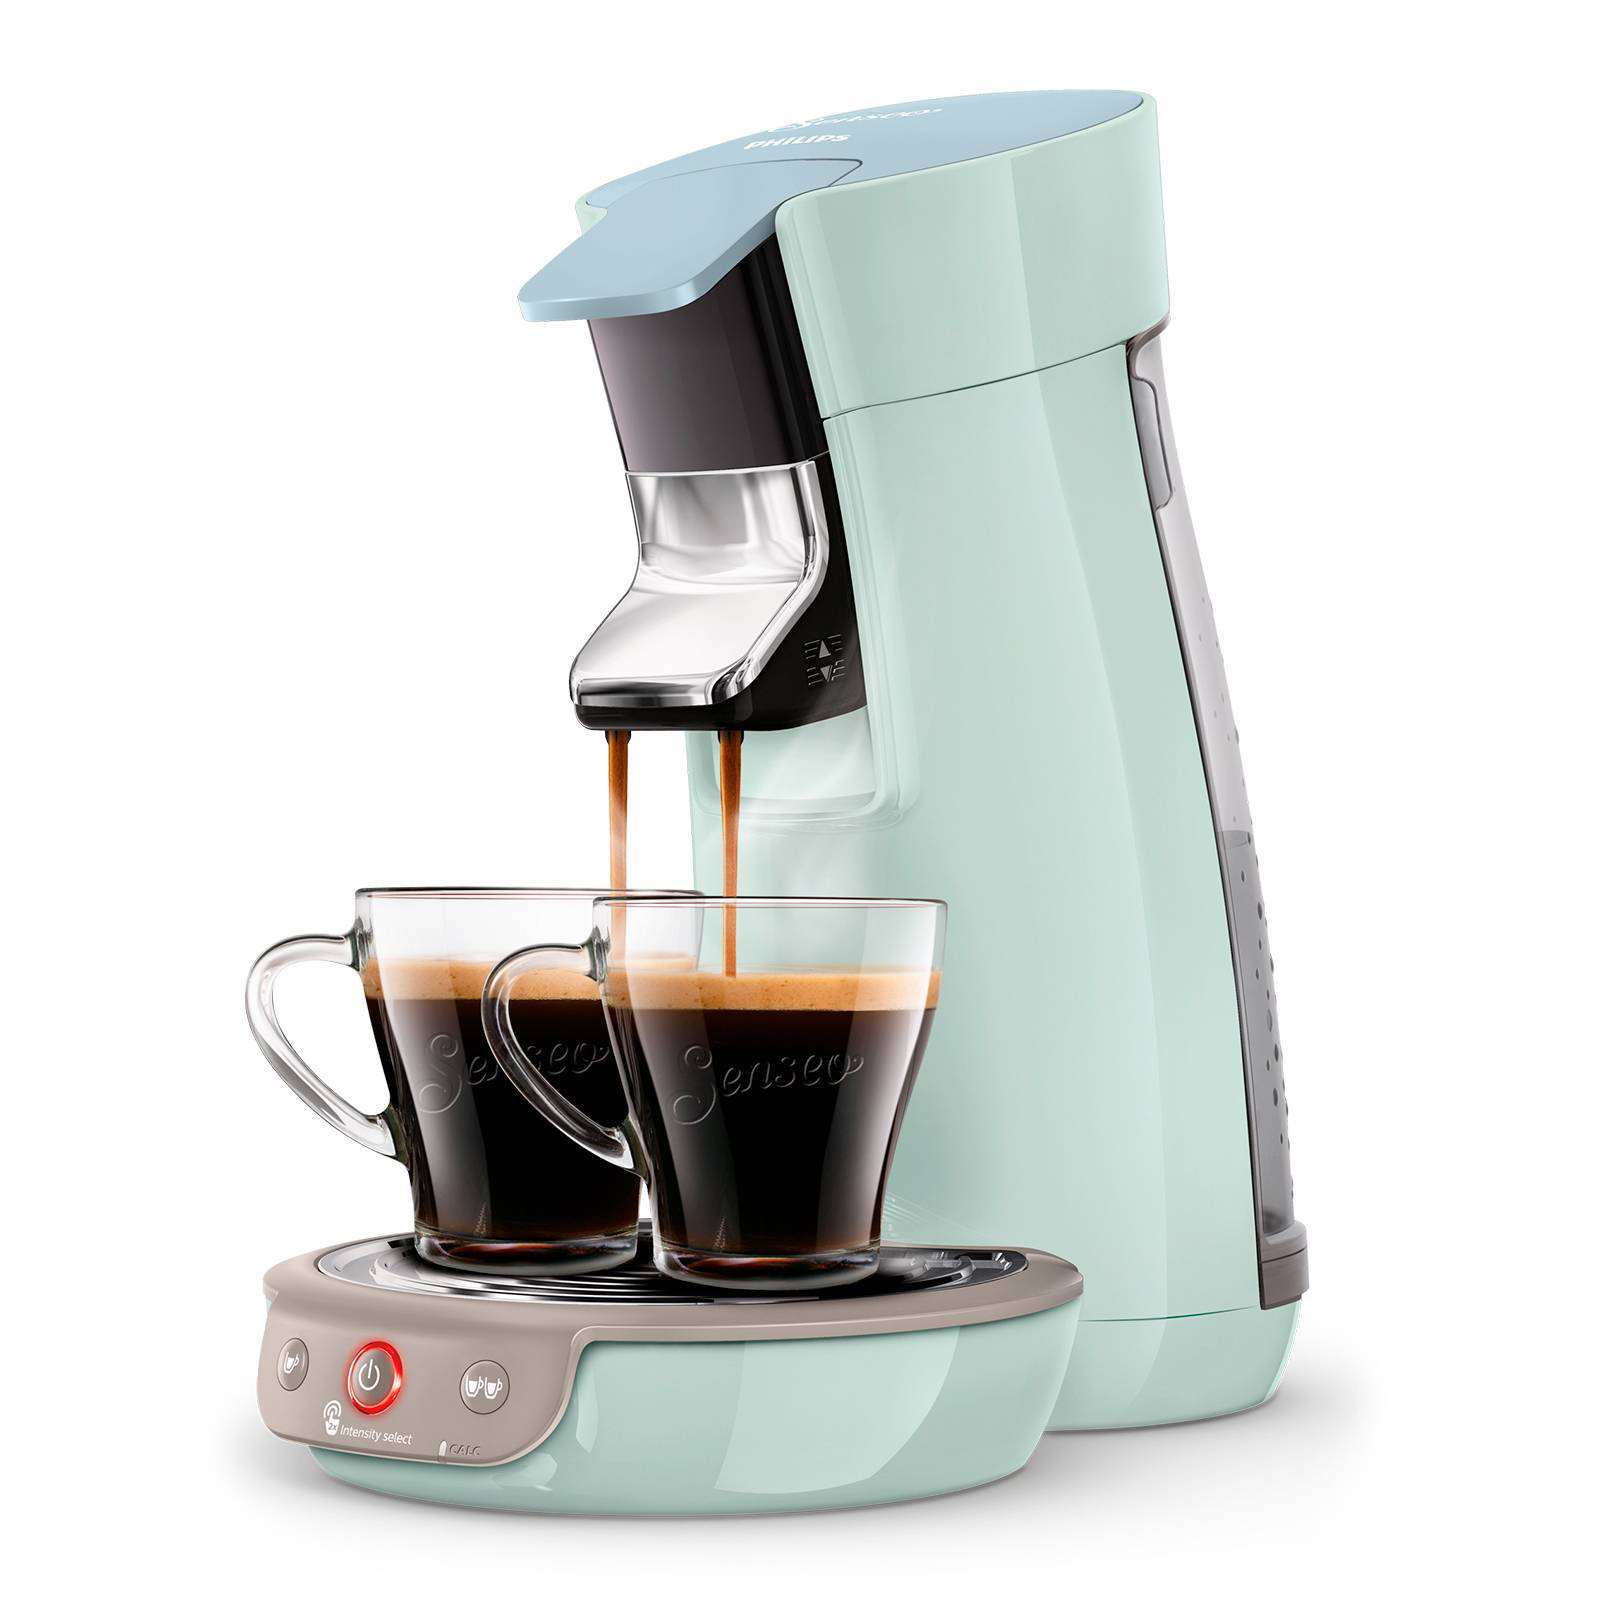 Philips Senseo Viva Café koffiezetapparaat HD6563/20